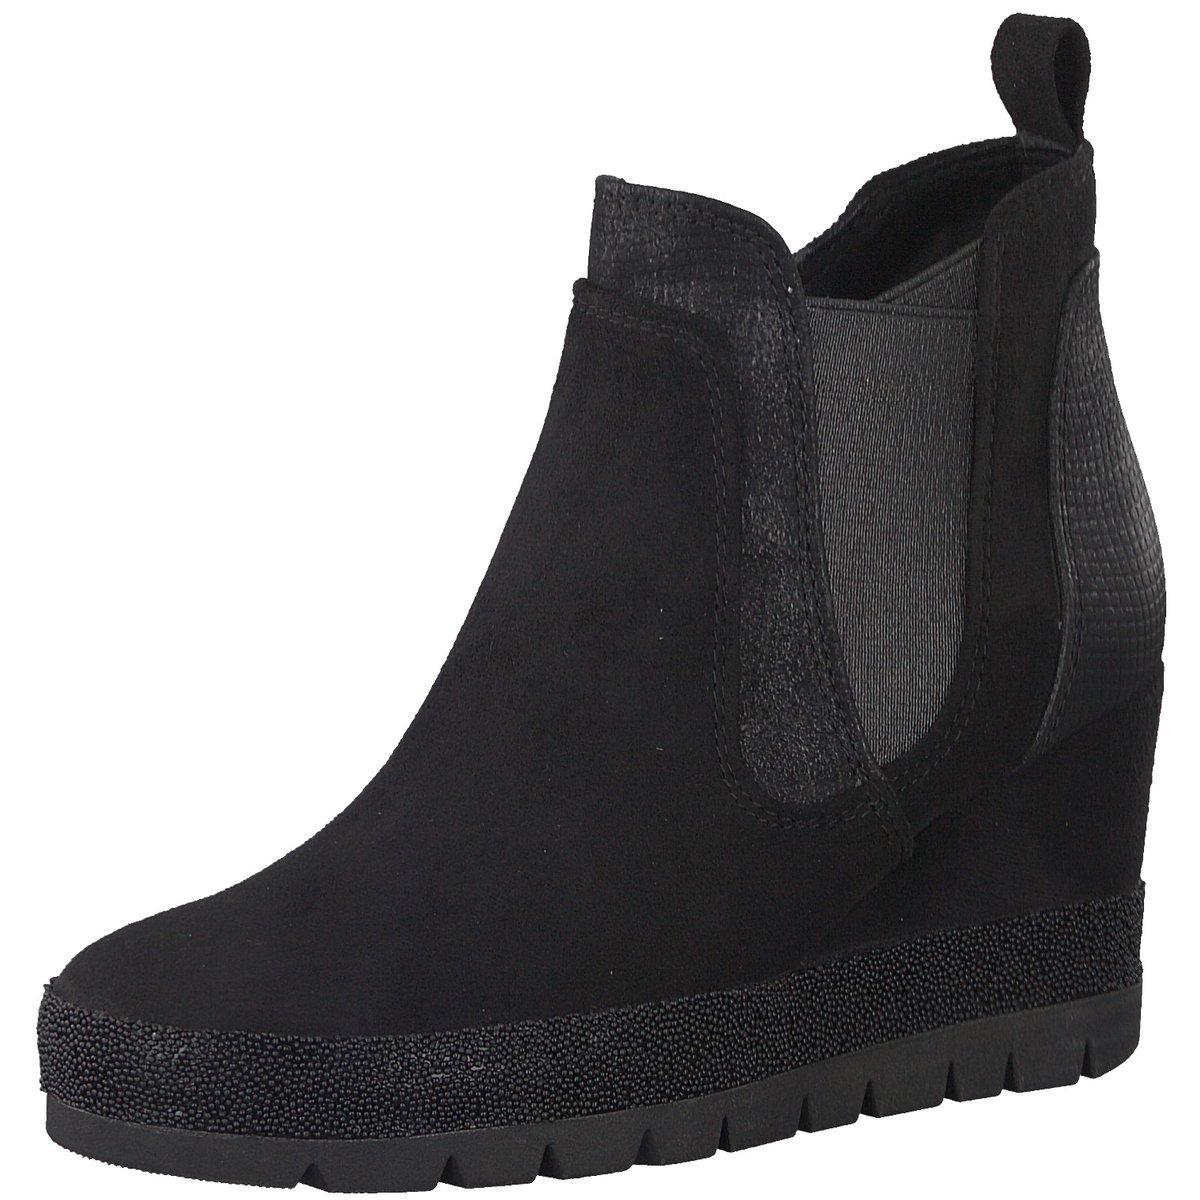 Marco Tozzi Damen Stiefeletten 2-2-25401-39 098 schwarz schwarz schwarz 310800 047656